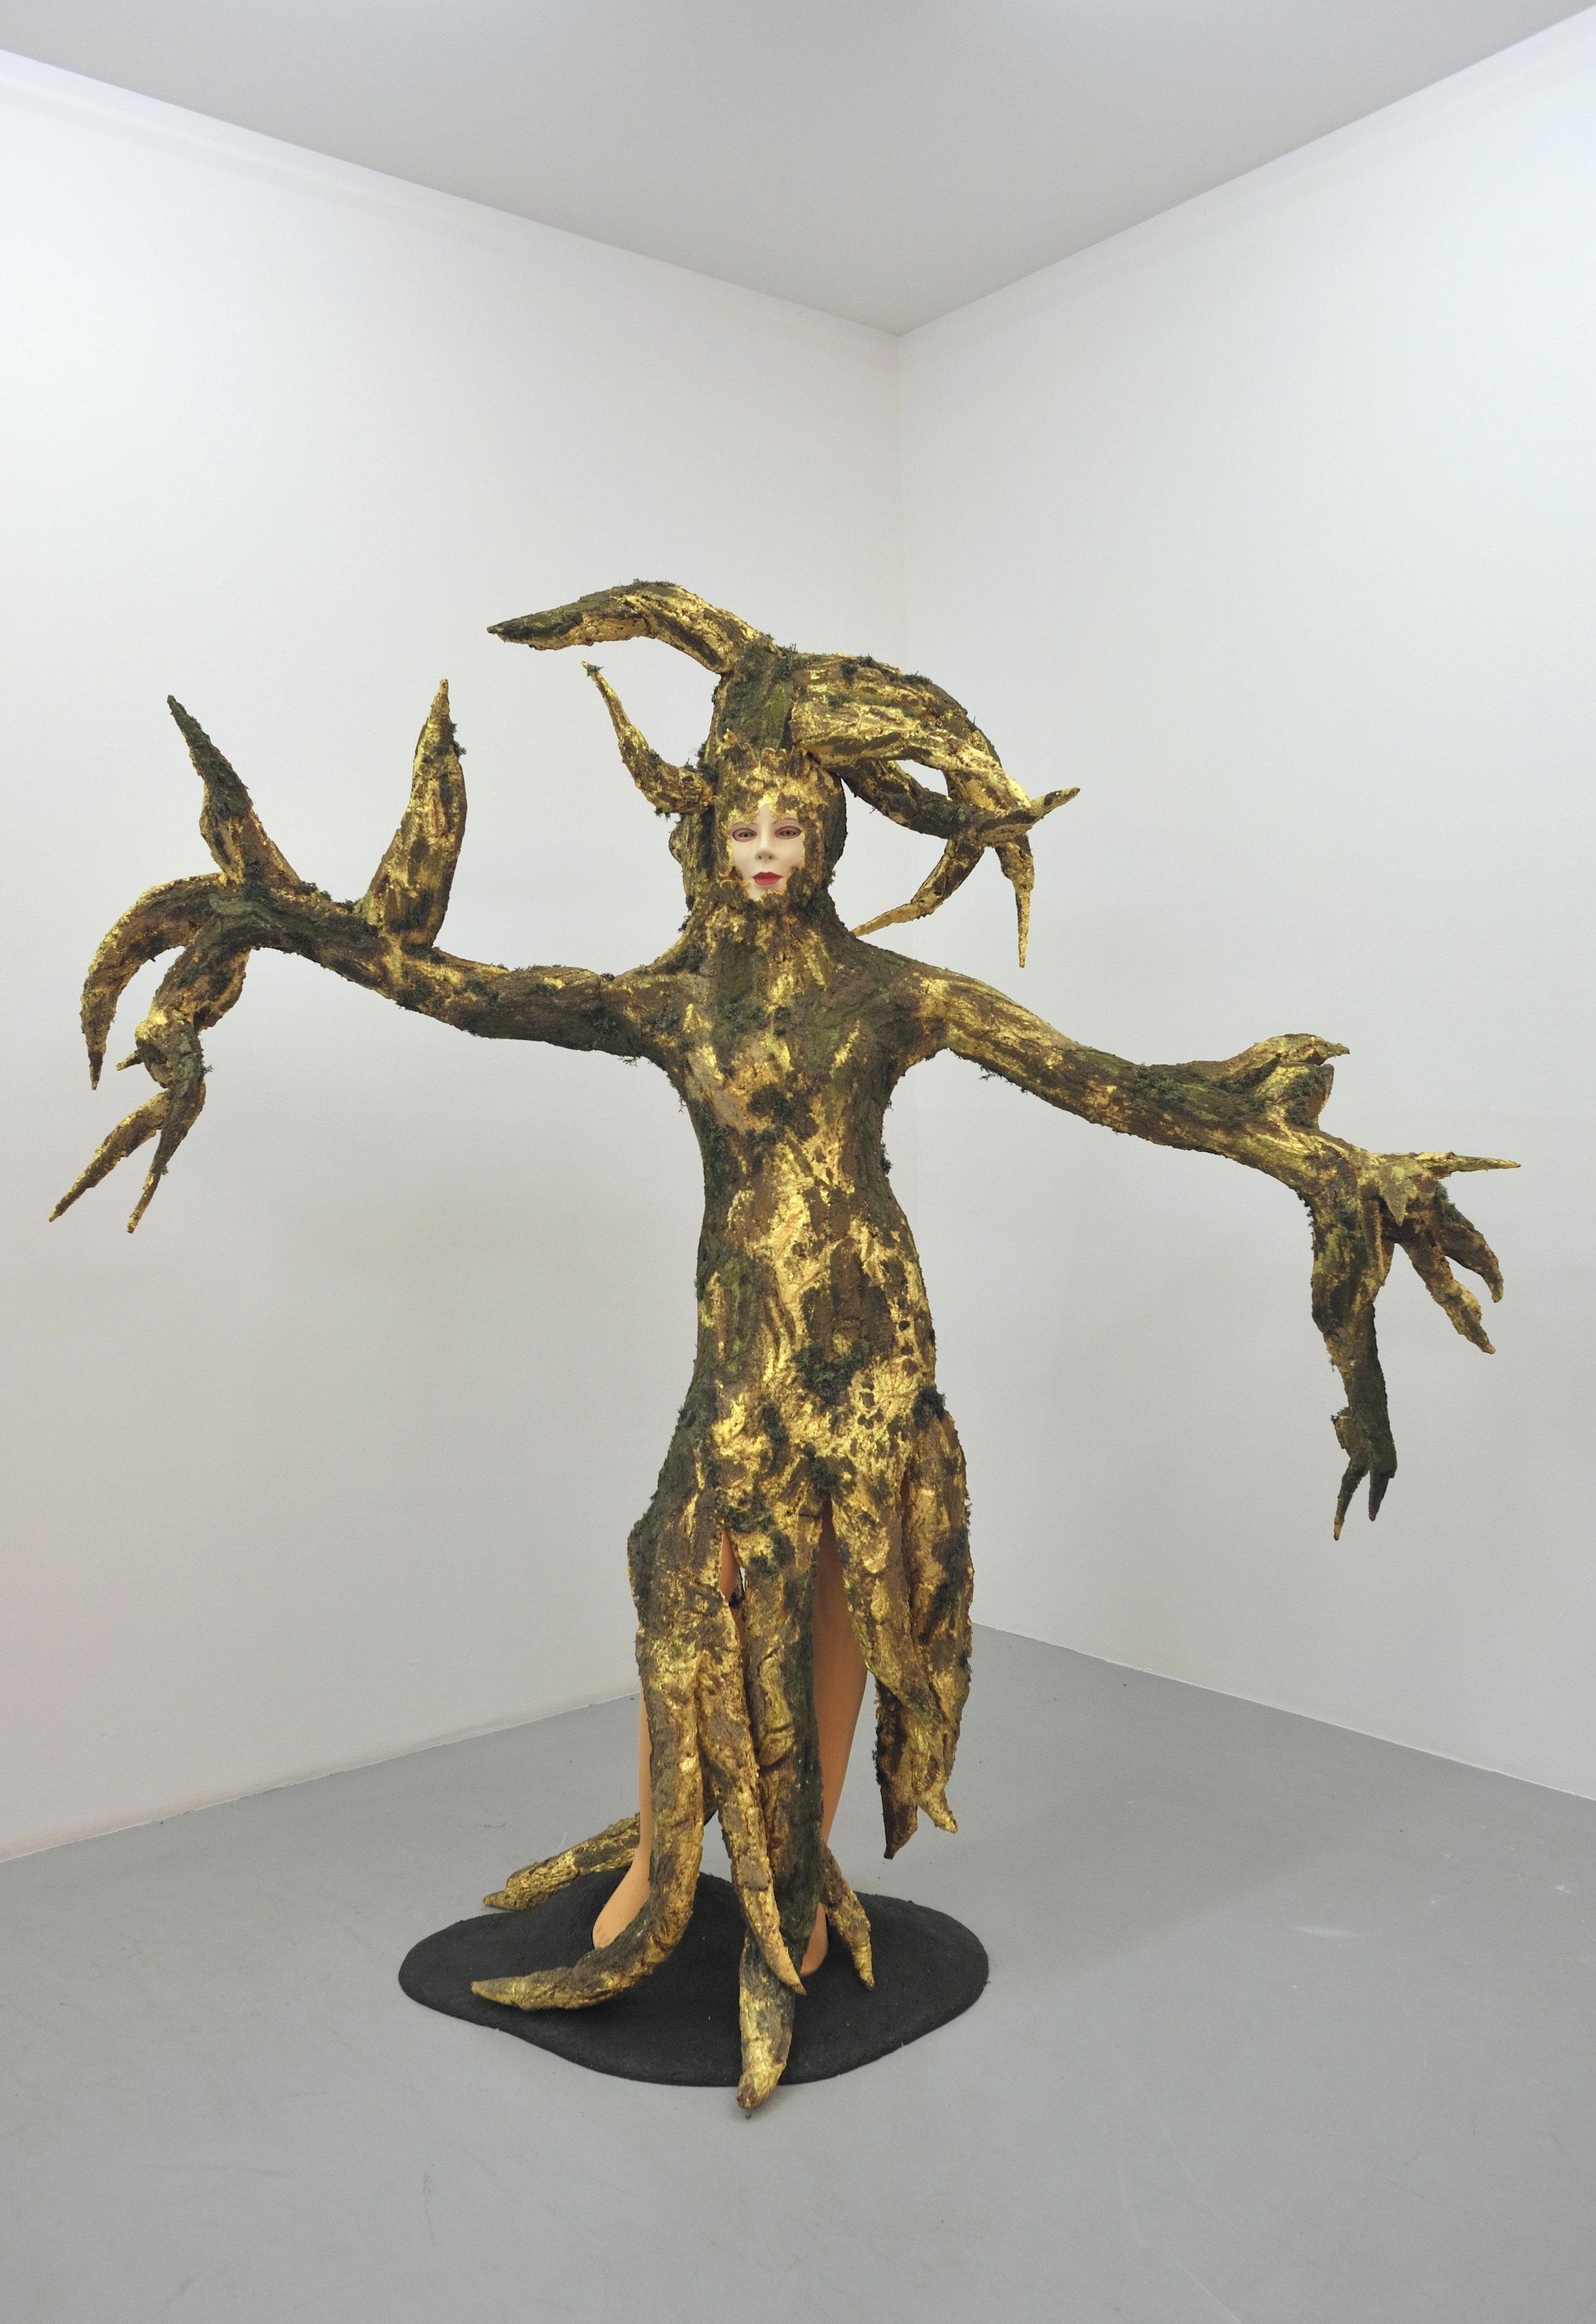 Spirit Tree, 2008 mannequin, wood, foam, gold leaf, aqua-resin and nylon fabric 195 x 81 cm - 76 x 31 7/8 inches